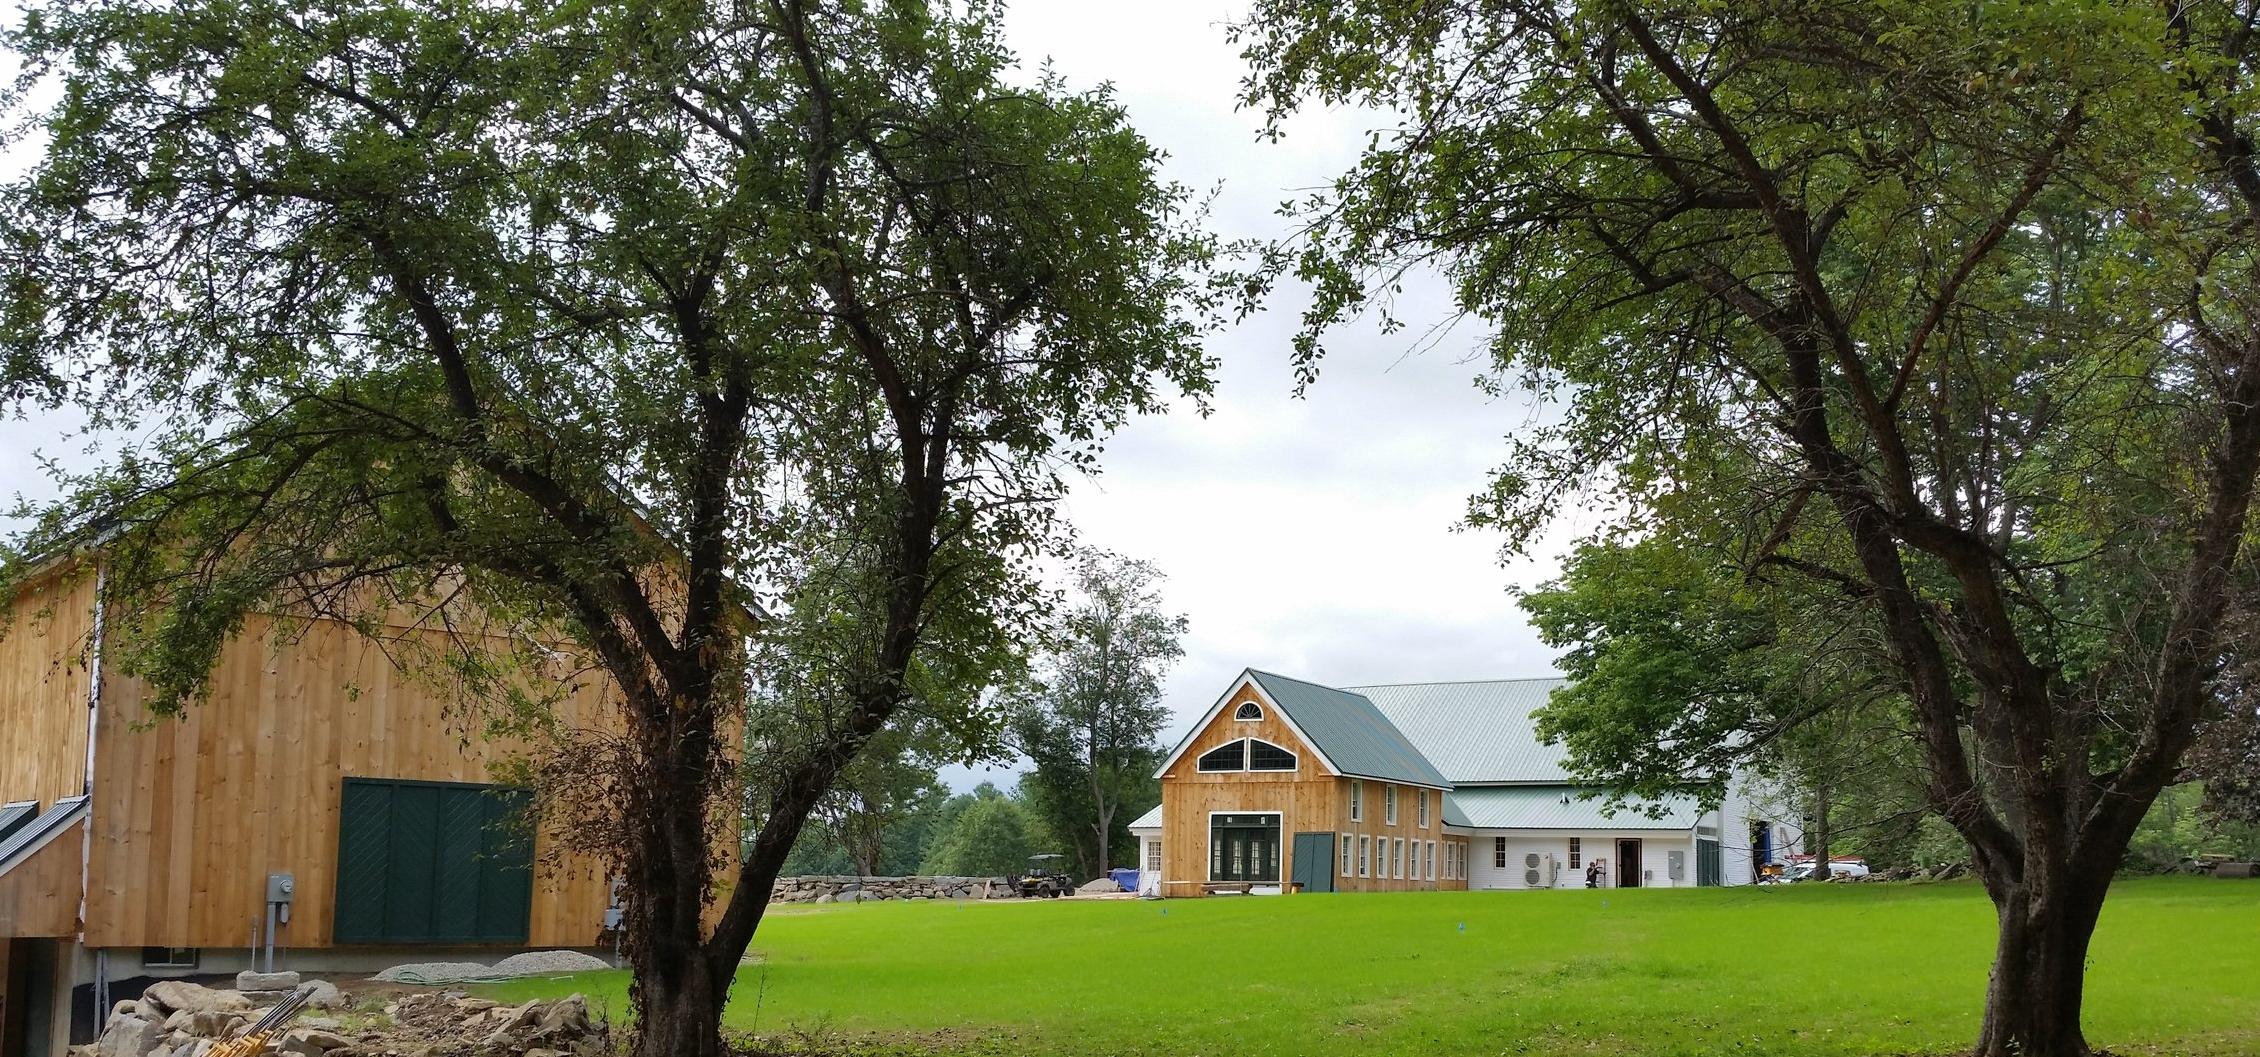 2 barns 2 trees.jpg